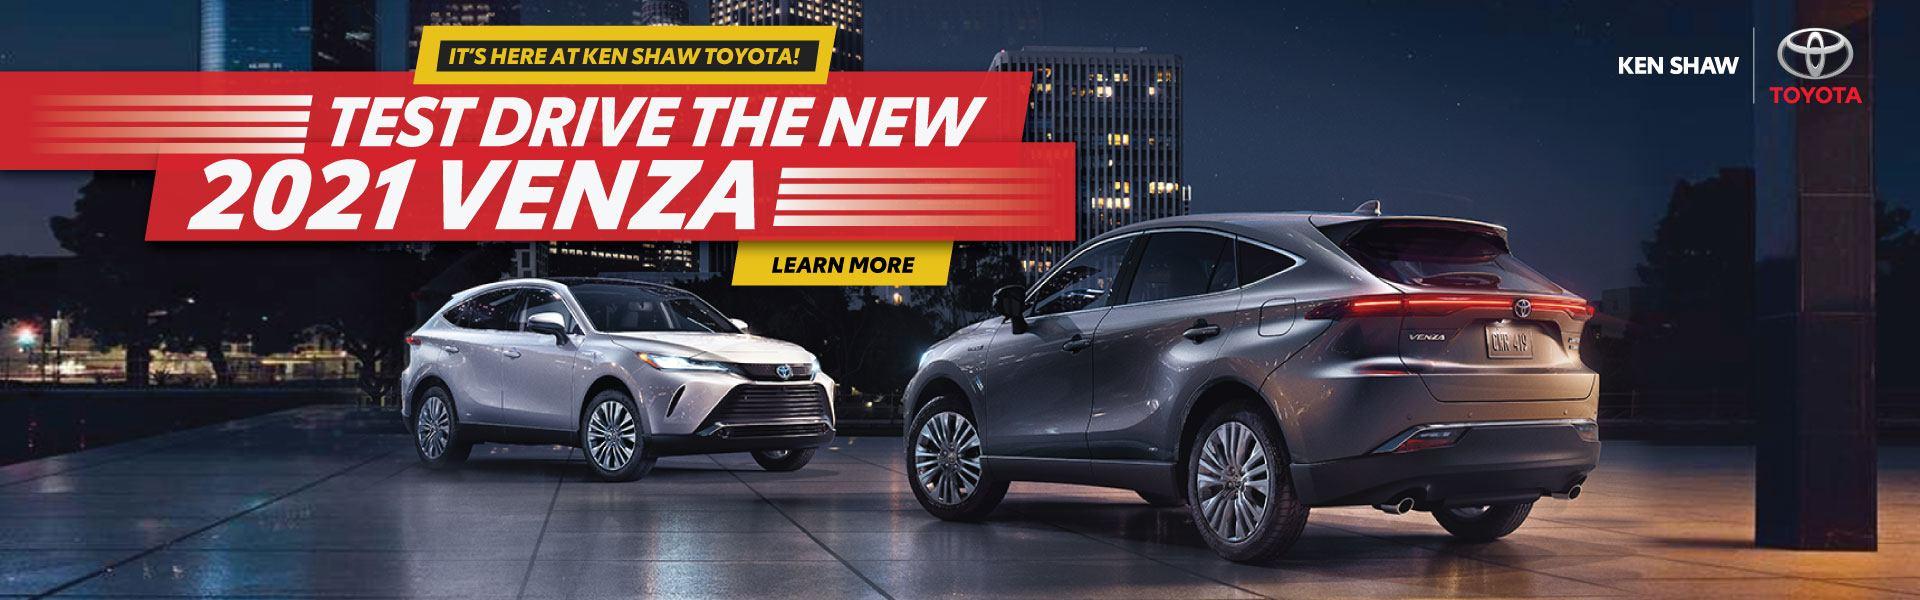 2021 Toyota Venza at Ken Shaw Toyota in Toronto Ontario